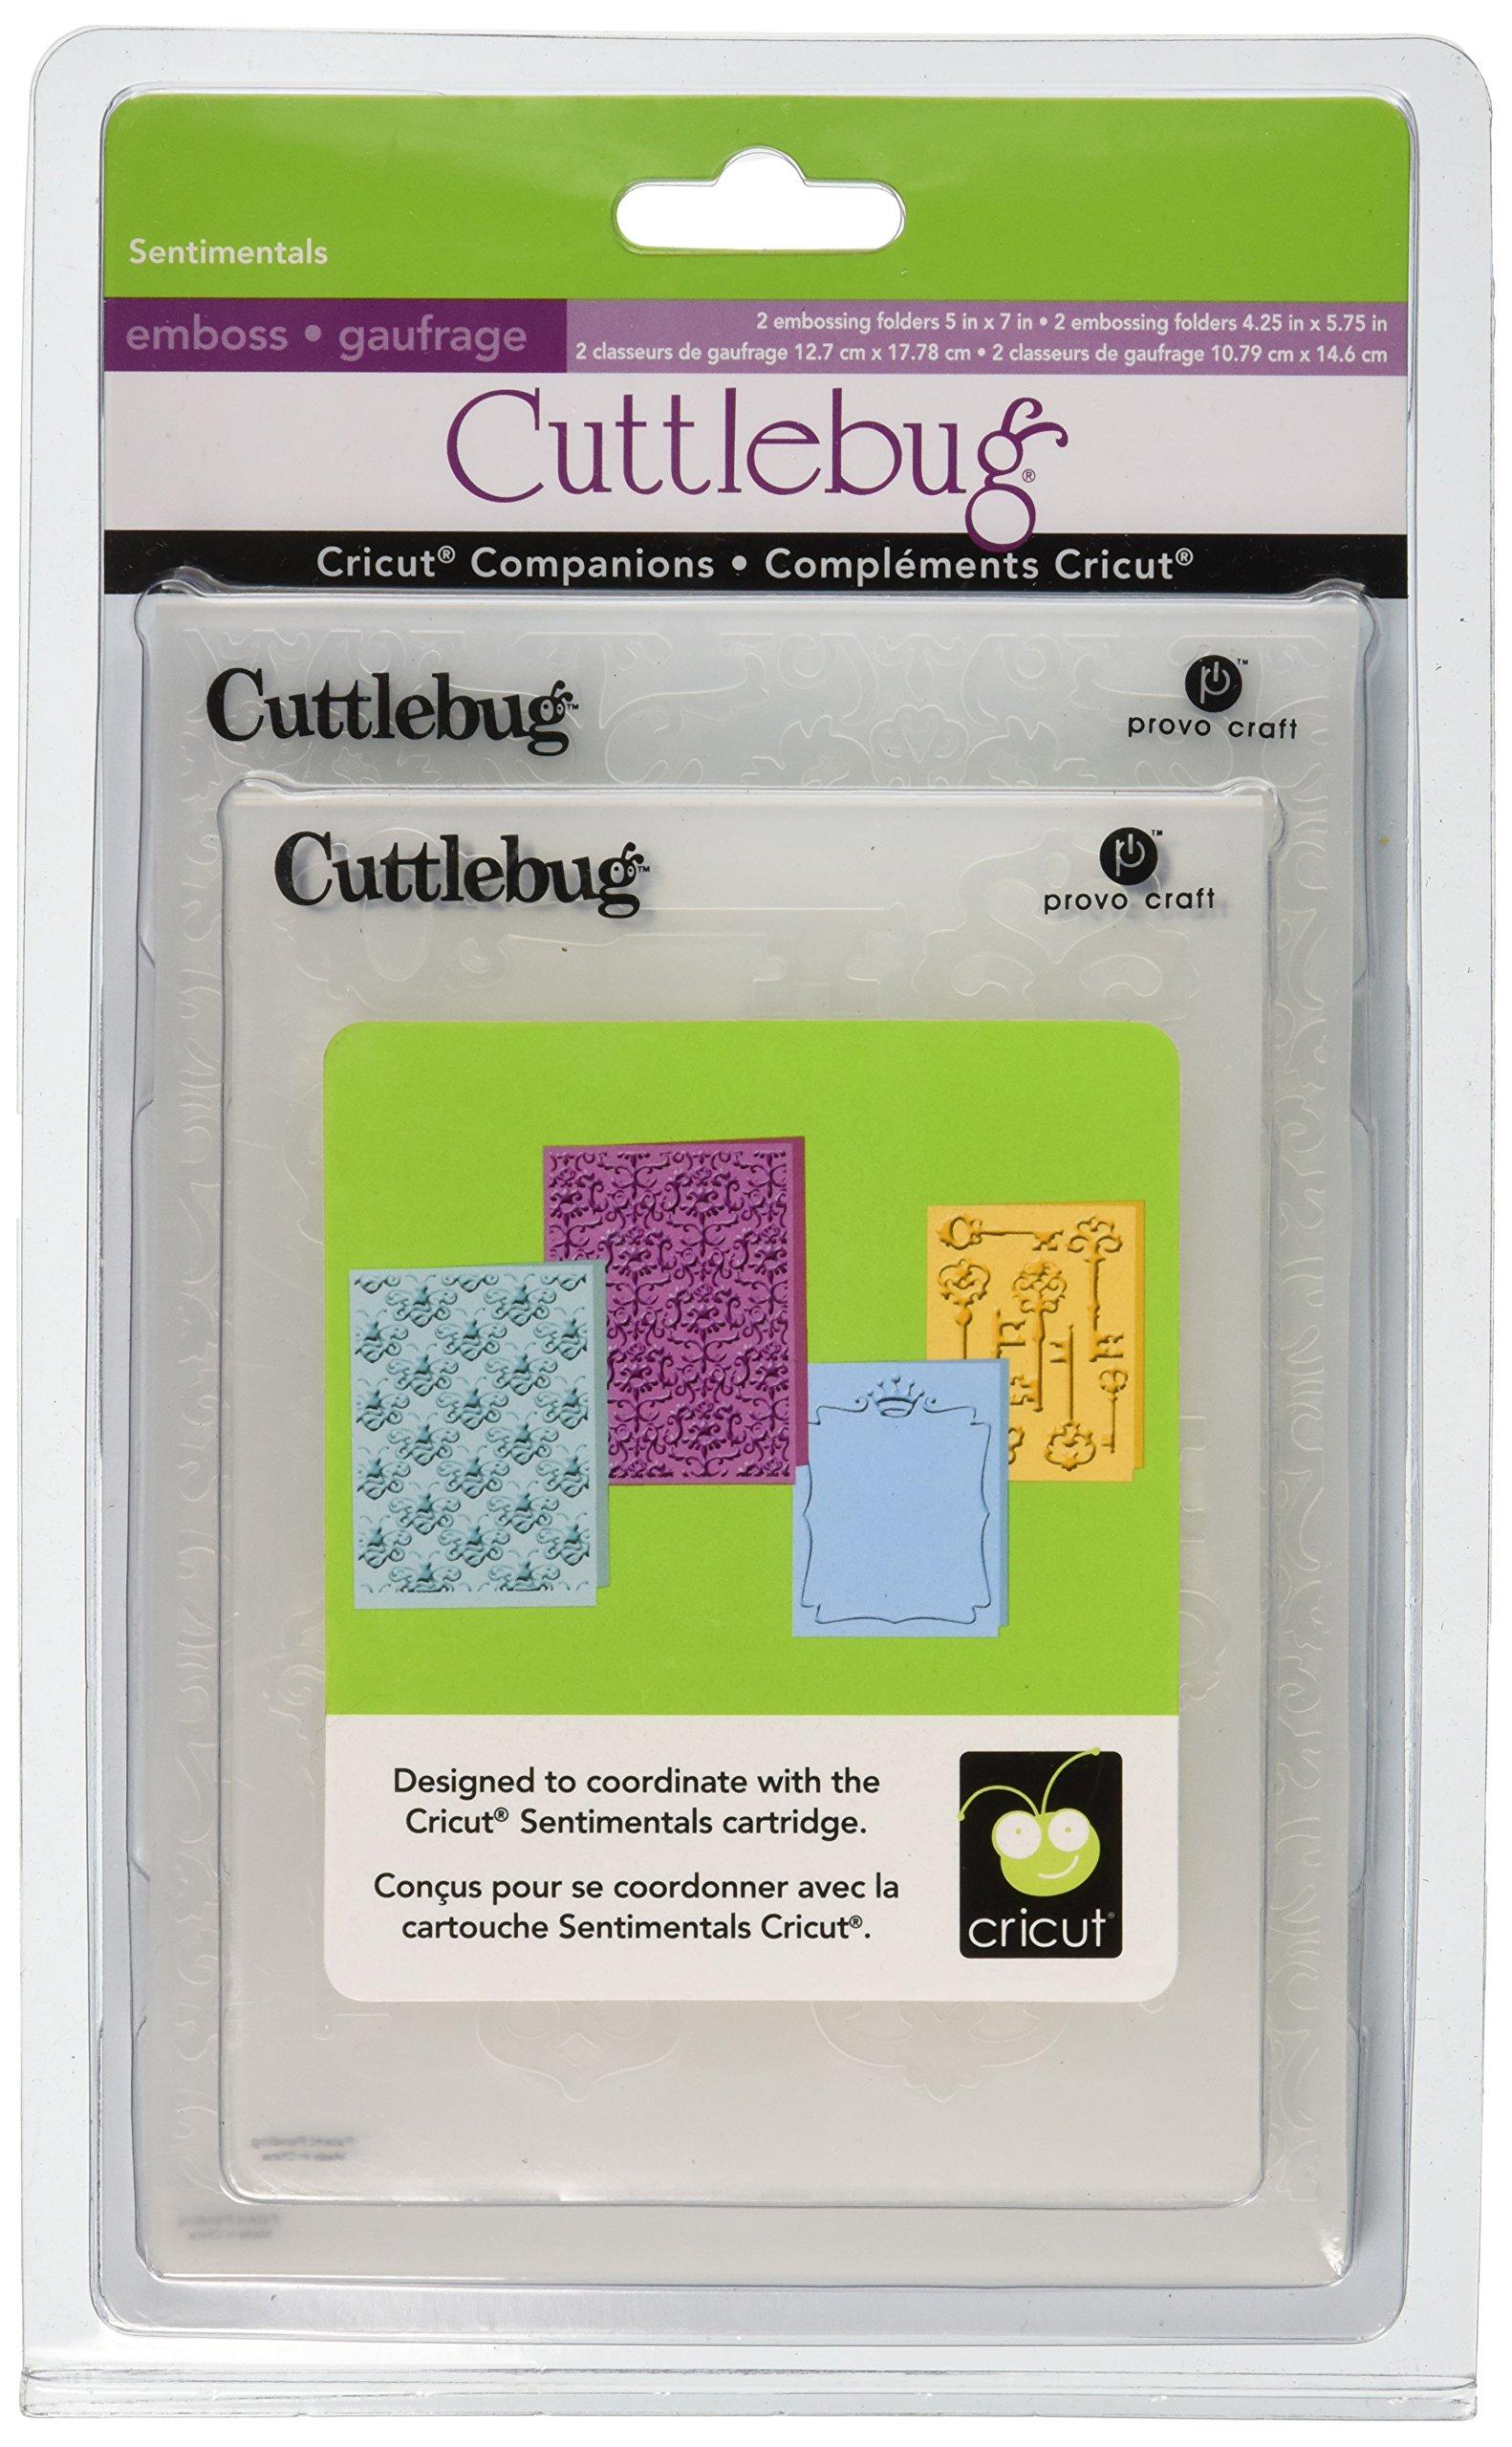 Cuttlebug Provo Craft Cricut Companion Embossing Folder Bundle, Sentimental